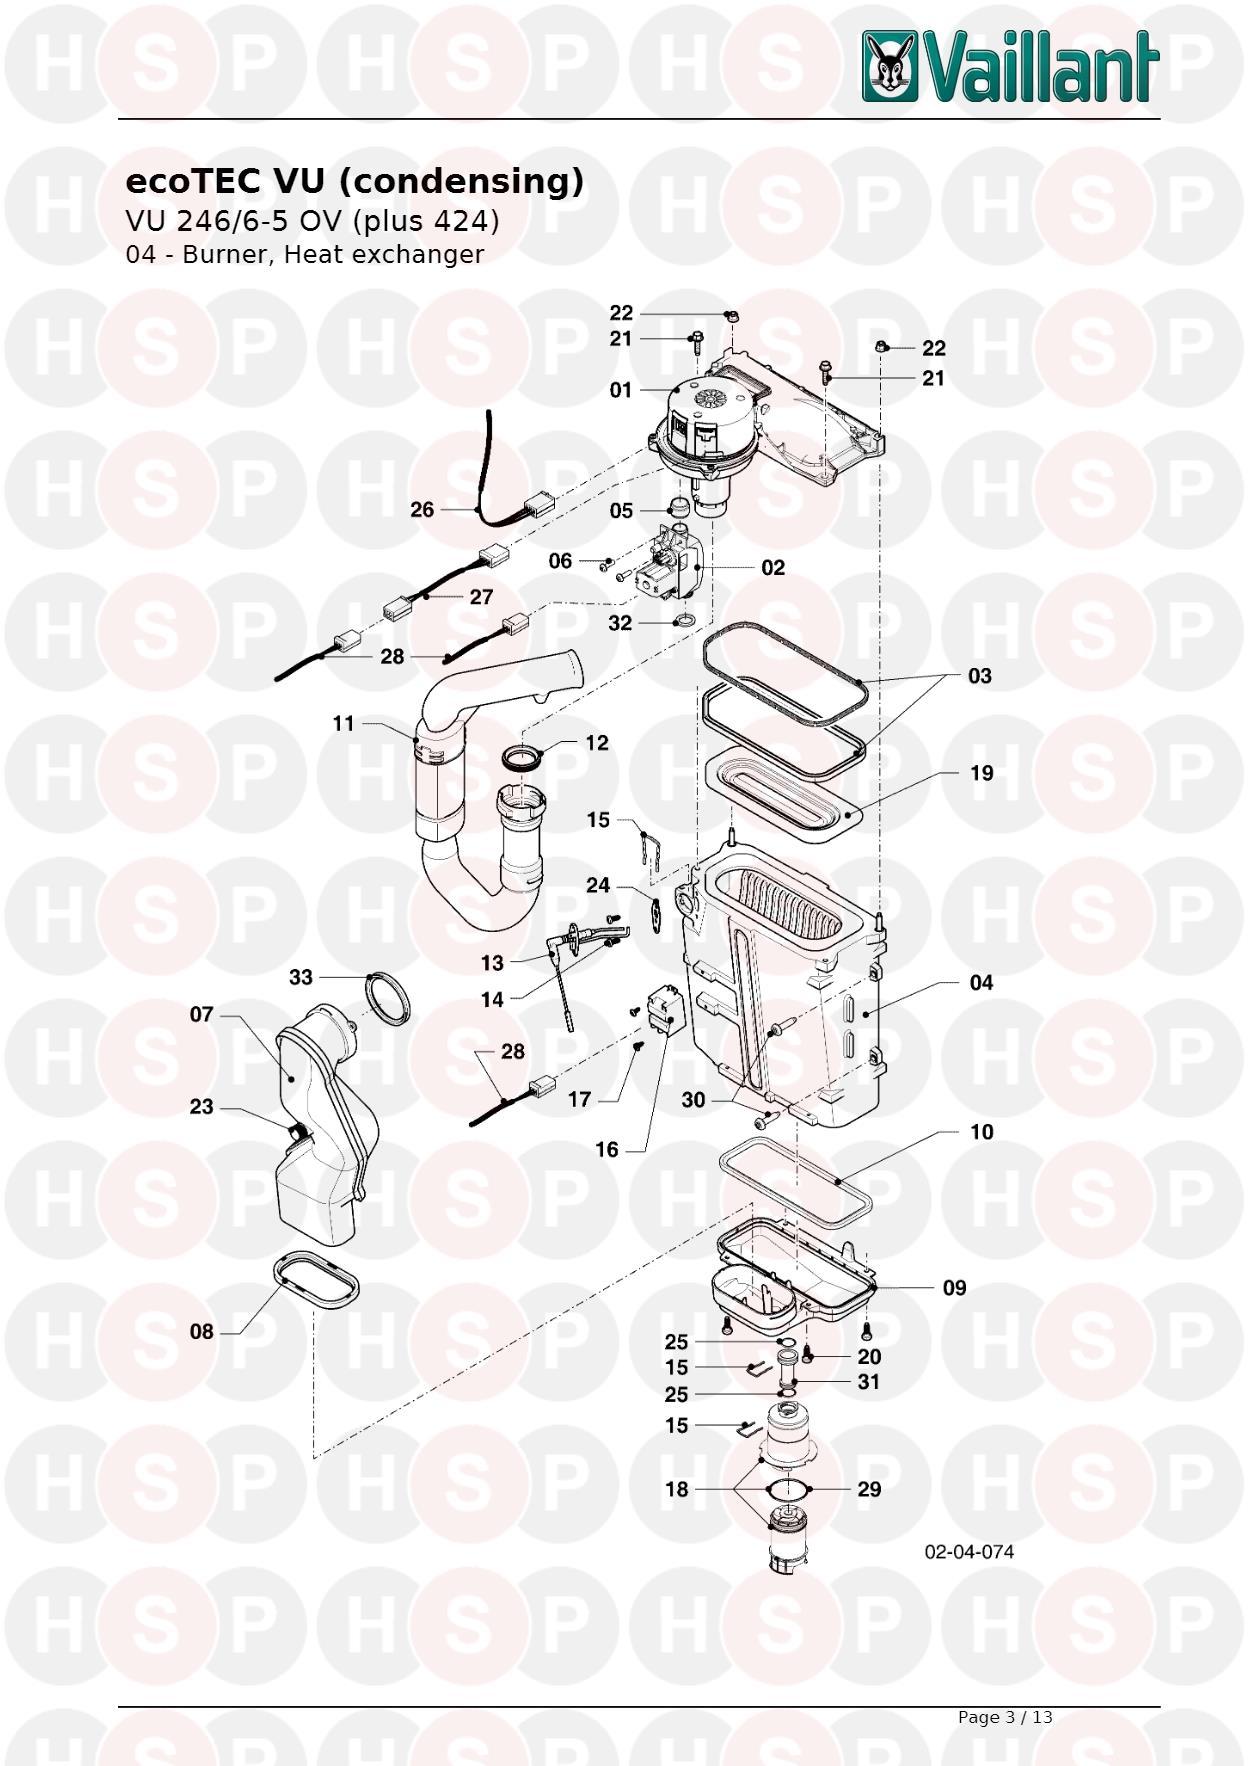 Vaillant ecotec plus 424 vu 2466 5 ov 2015 2016 04 burner heat 04 burner heat exchanger diagram for vaillant ecotec plus 424 vu 2466 5 asfbconference2016 Gallery